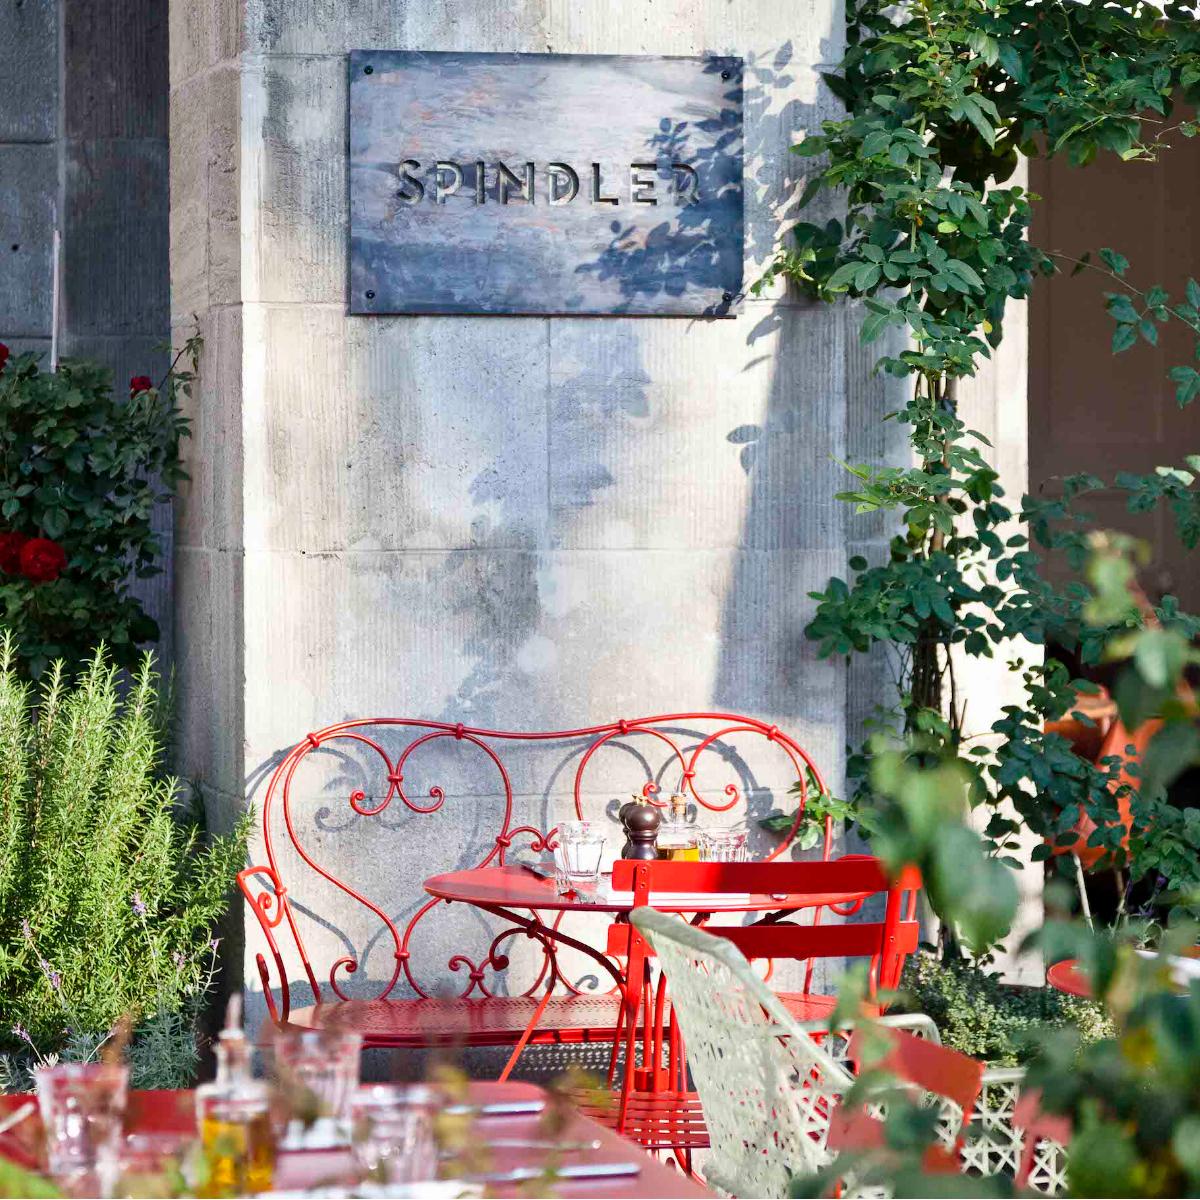 Spindler Berlin Terrasse